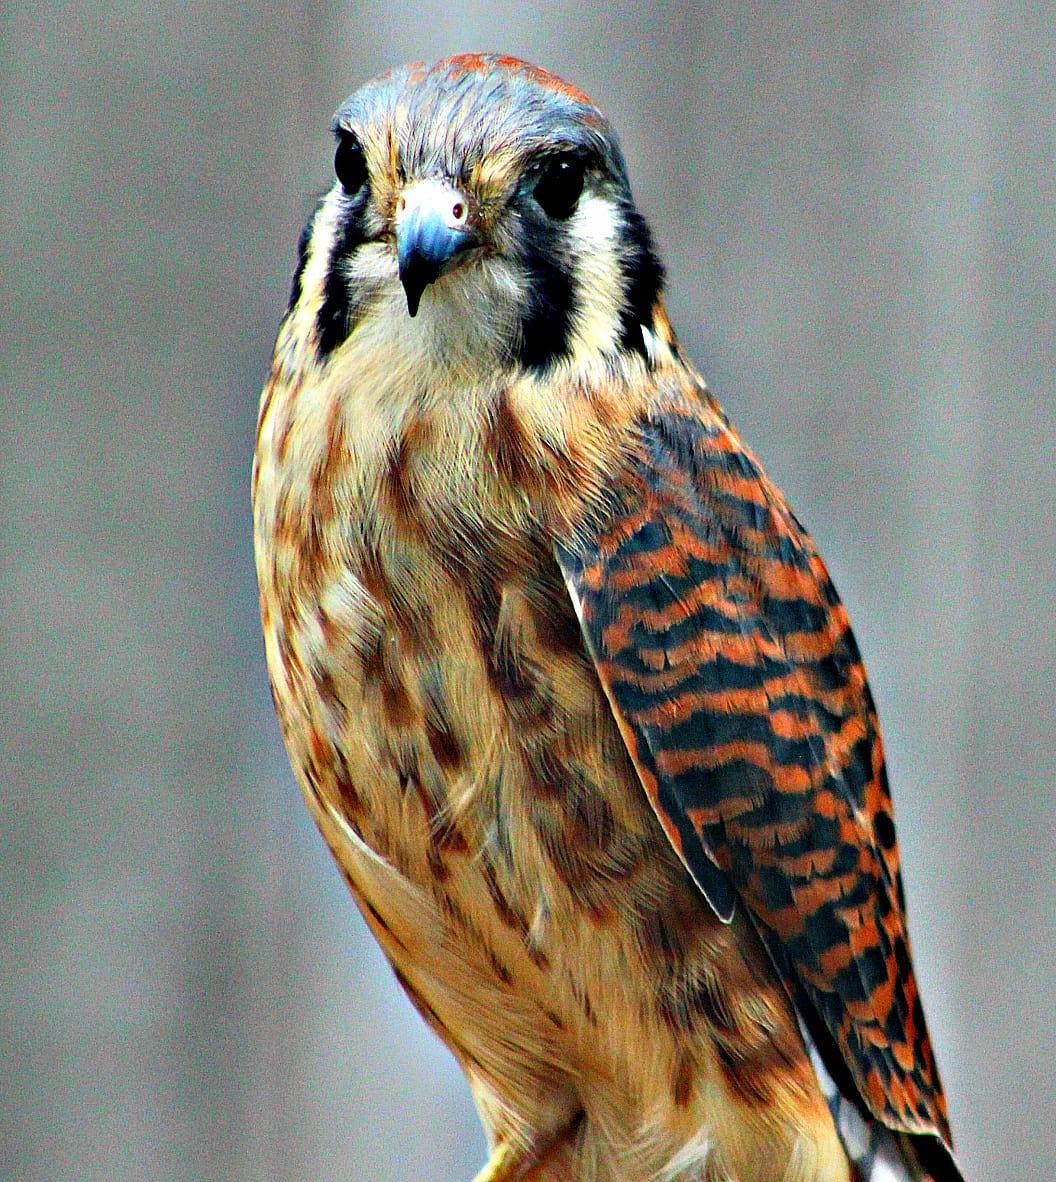 the wee falcon north american kestrel